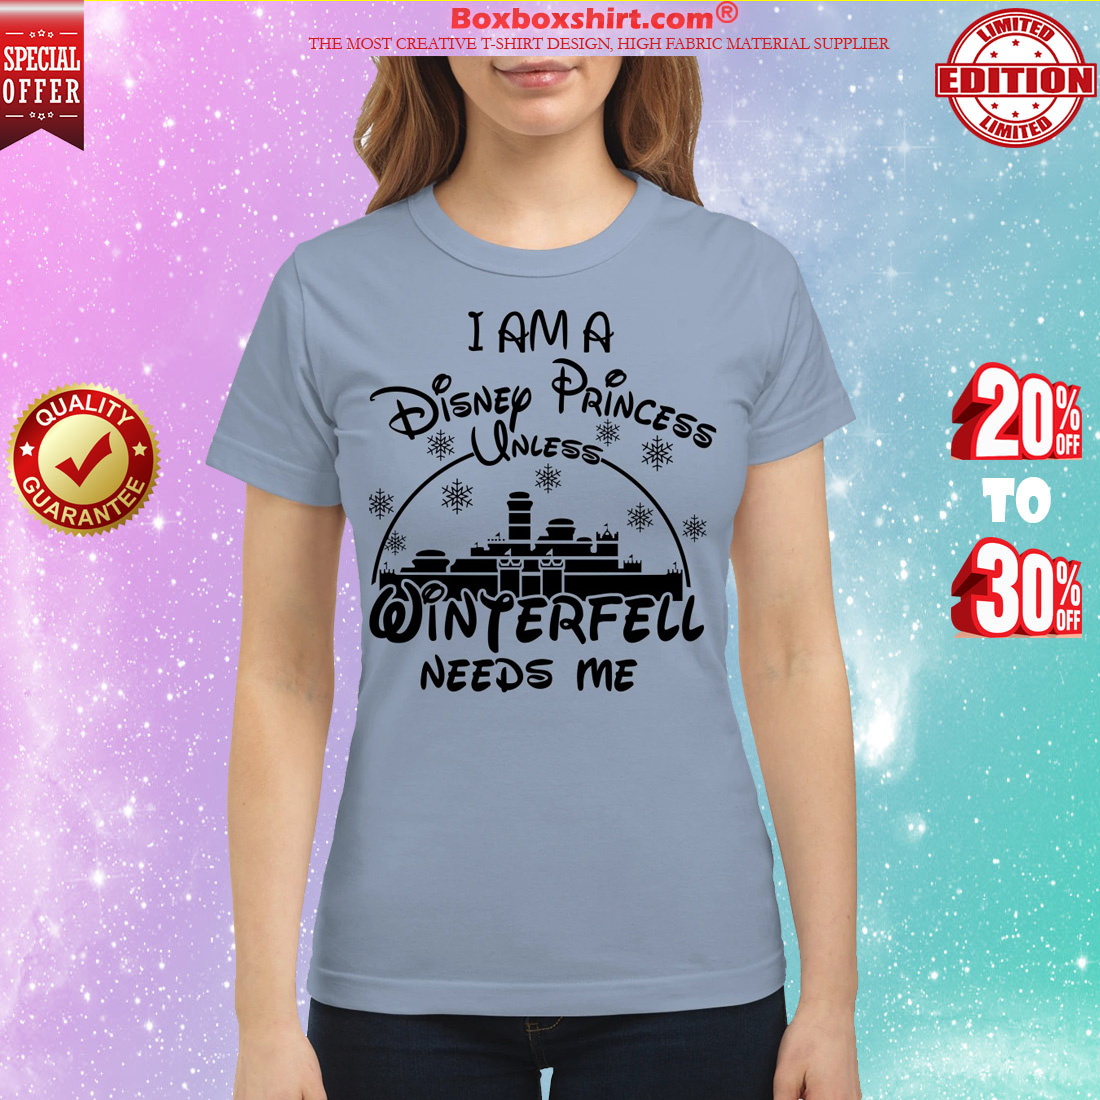 I am a disney Princess unless winterfell needs me classic shirt